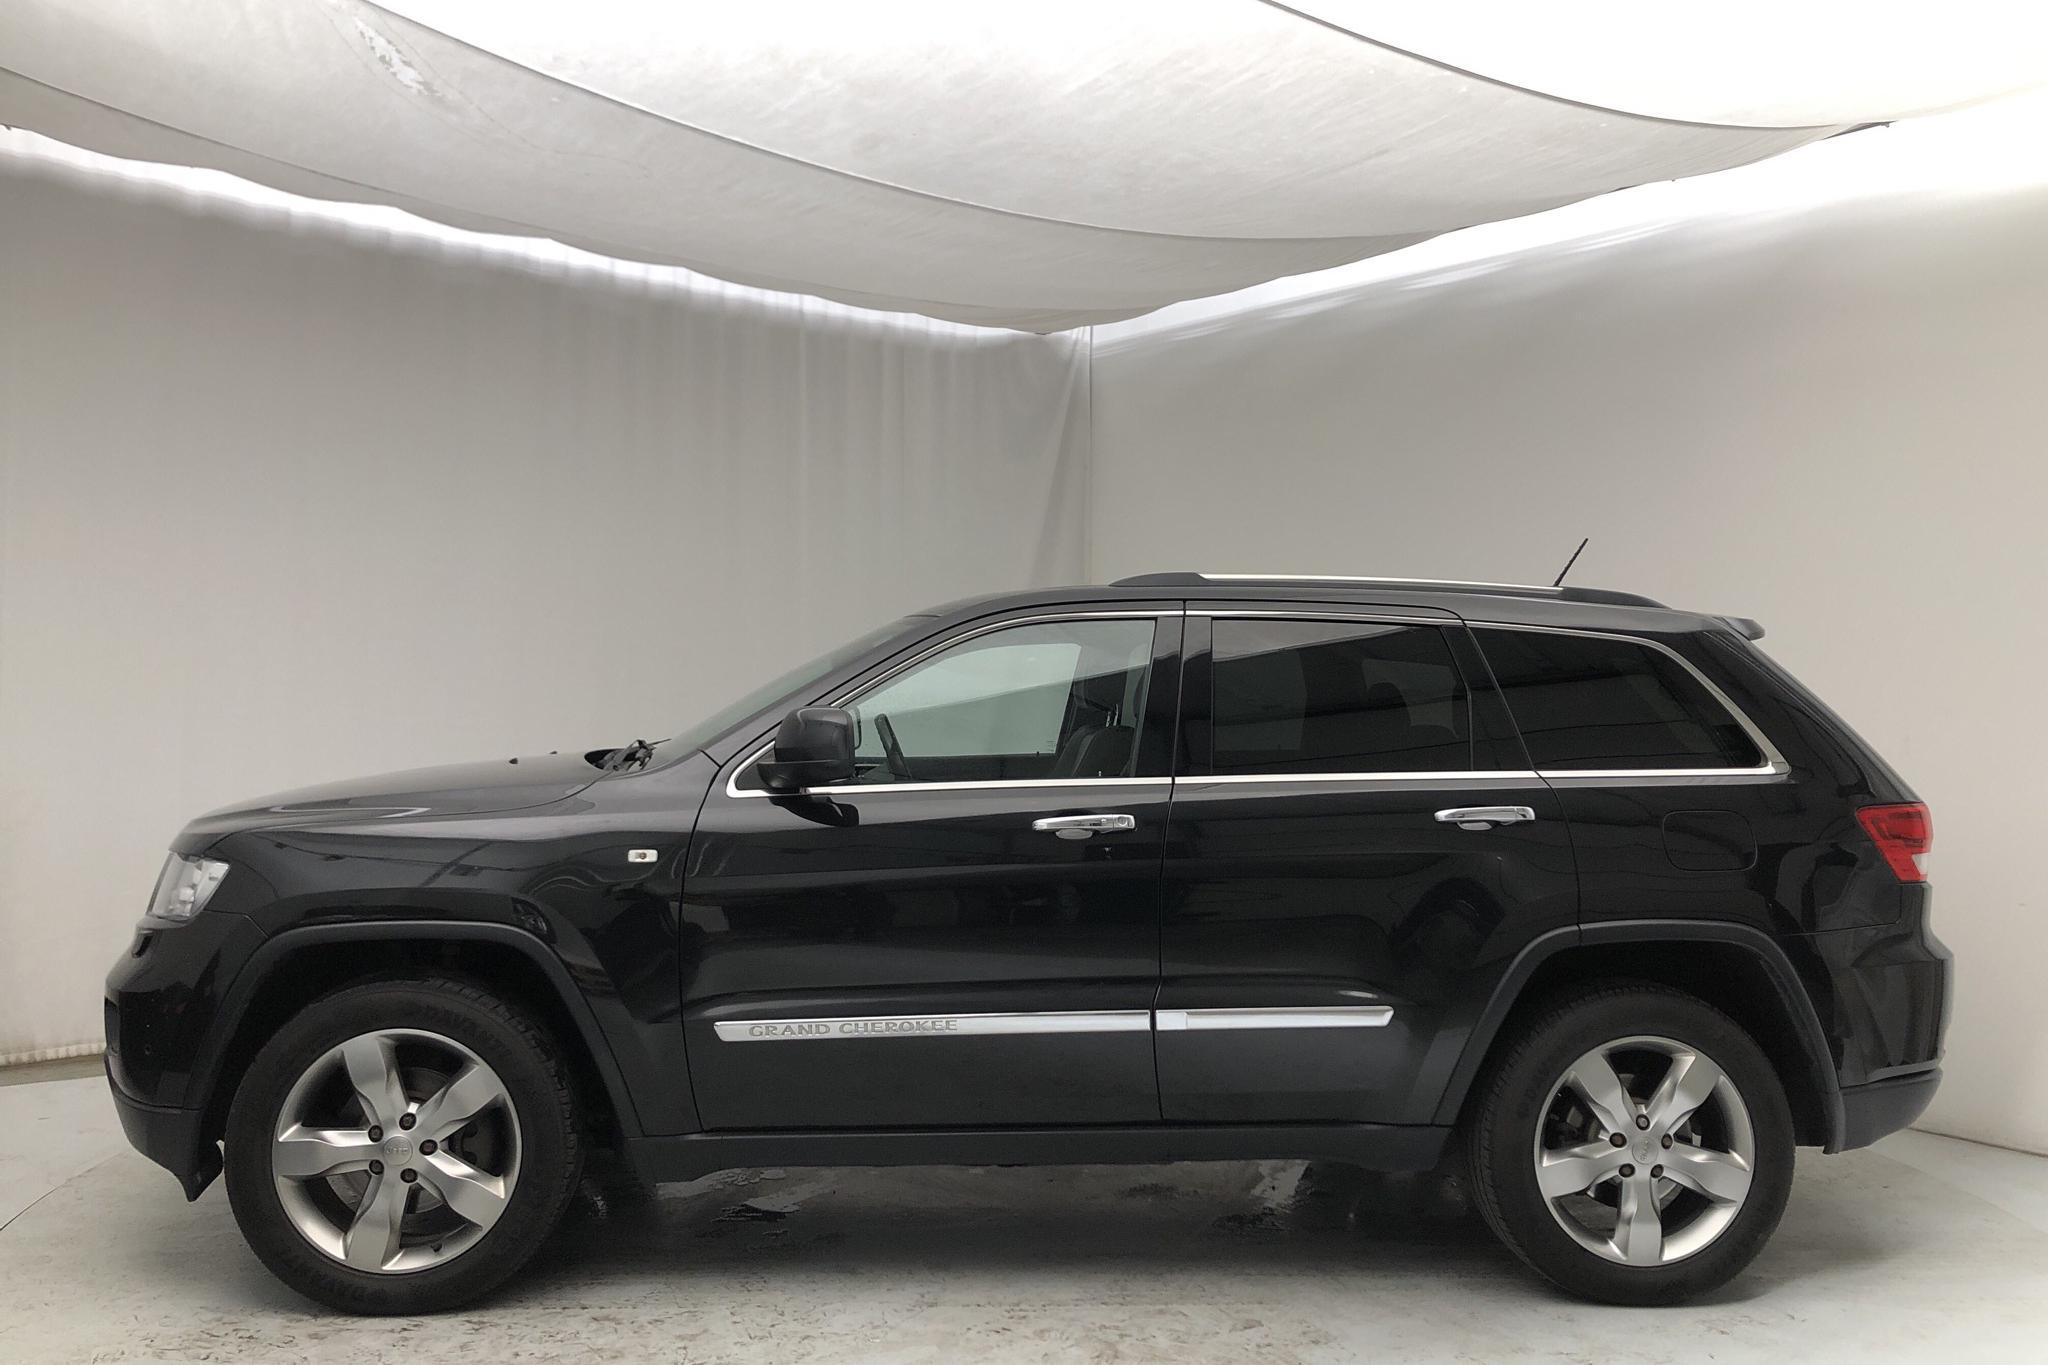 Jeep Grand Cherokee 3.0 CRD V6 (241hk) - 226 630 km - Automatic - black - 2013